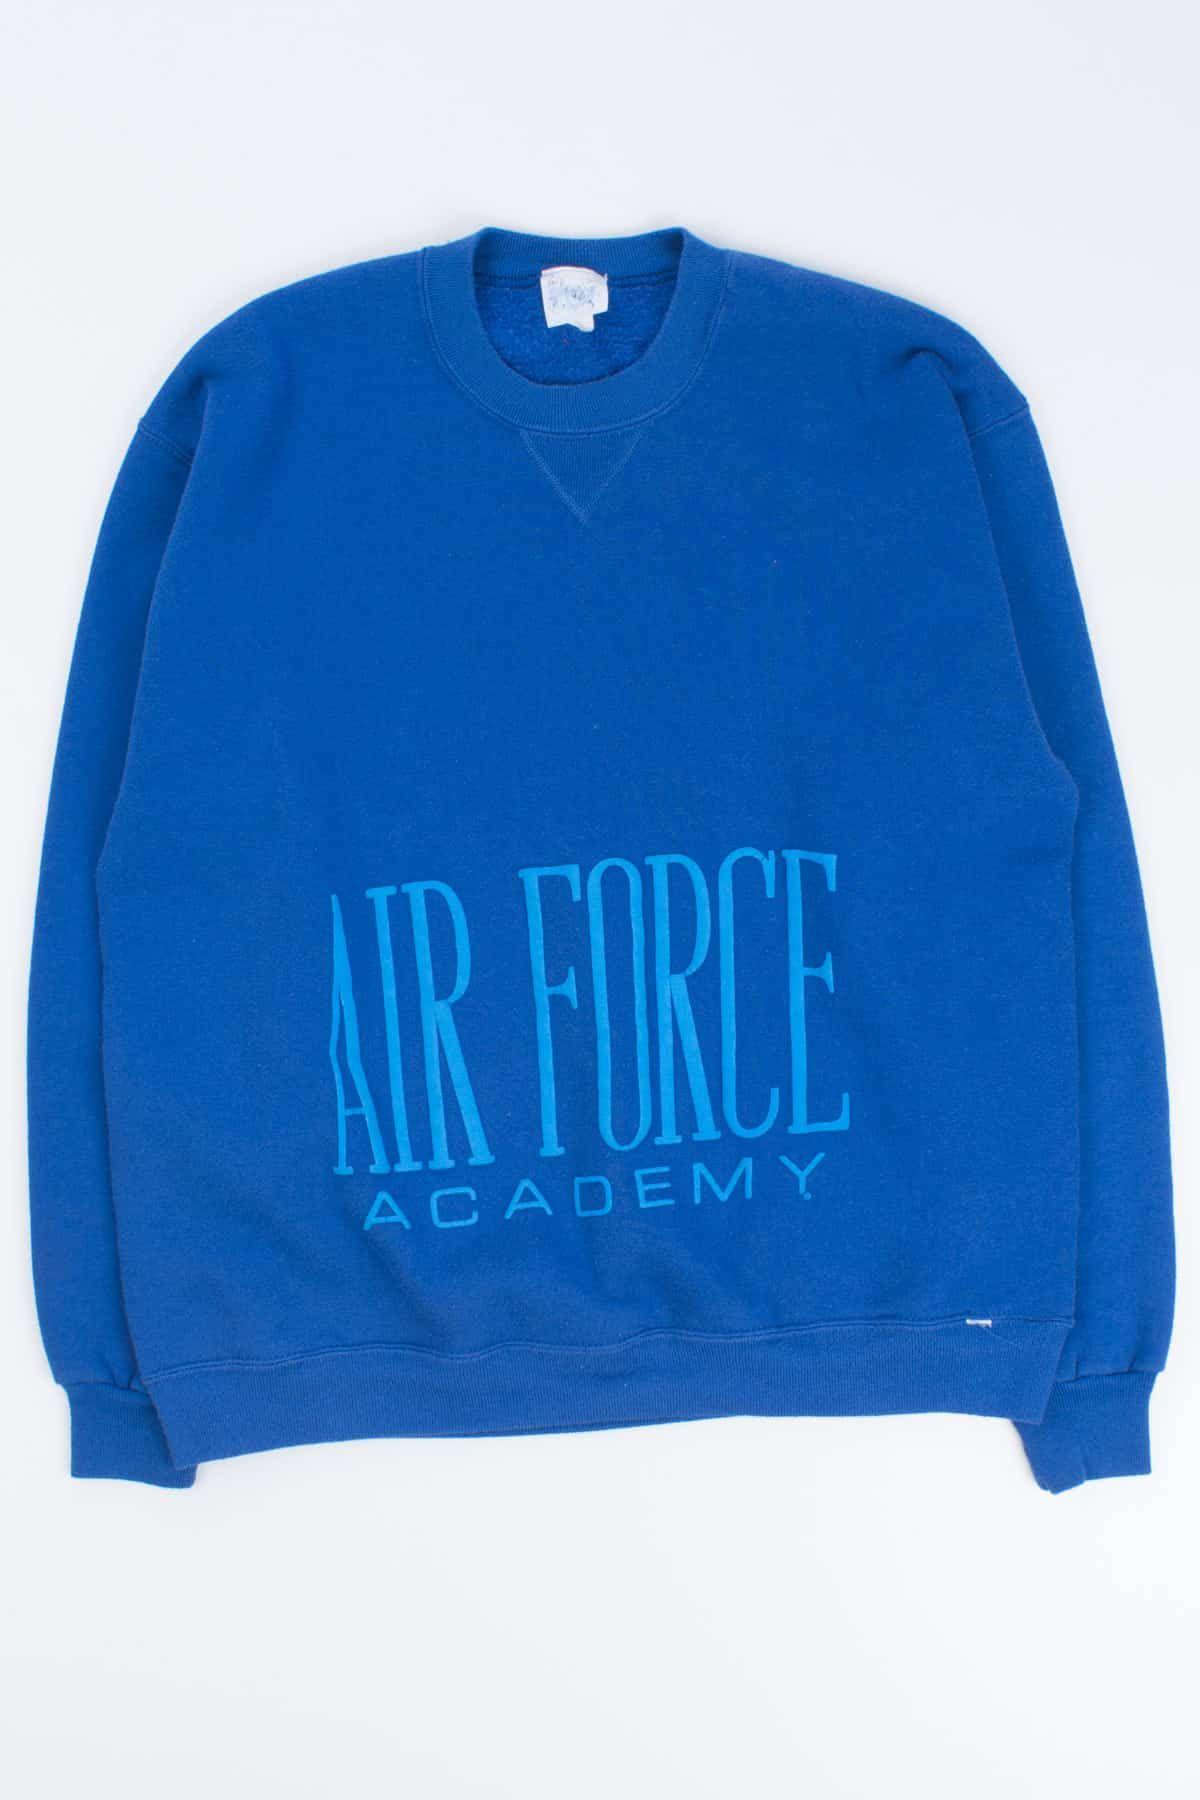 Vintage Air Force Academy Crewneck Sweatshirt Ragstock Crew Neck Sweatshirt Sweatshirts Air Force Academy [ 1800 x 1200 Pixel ]